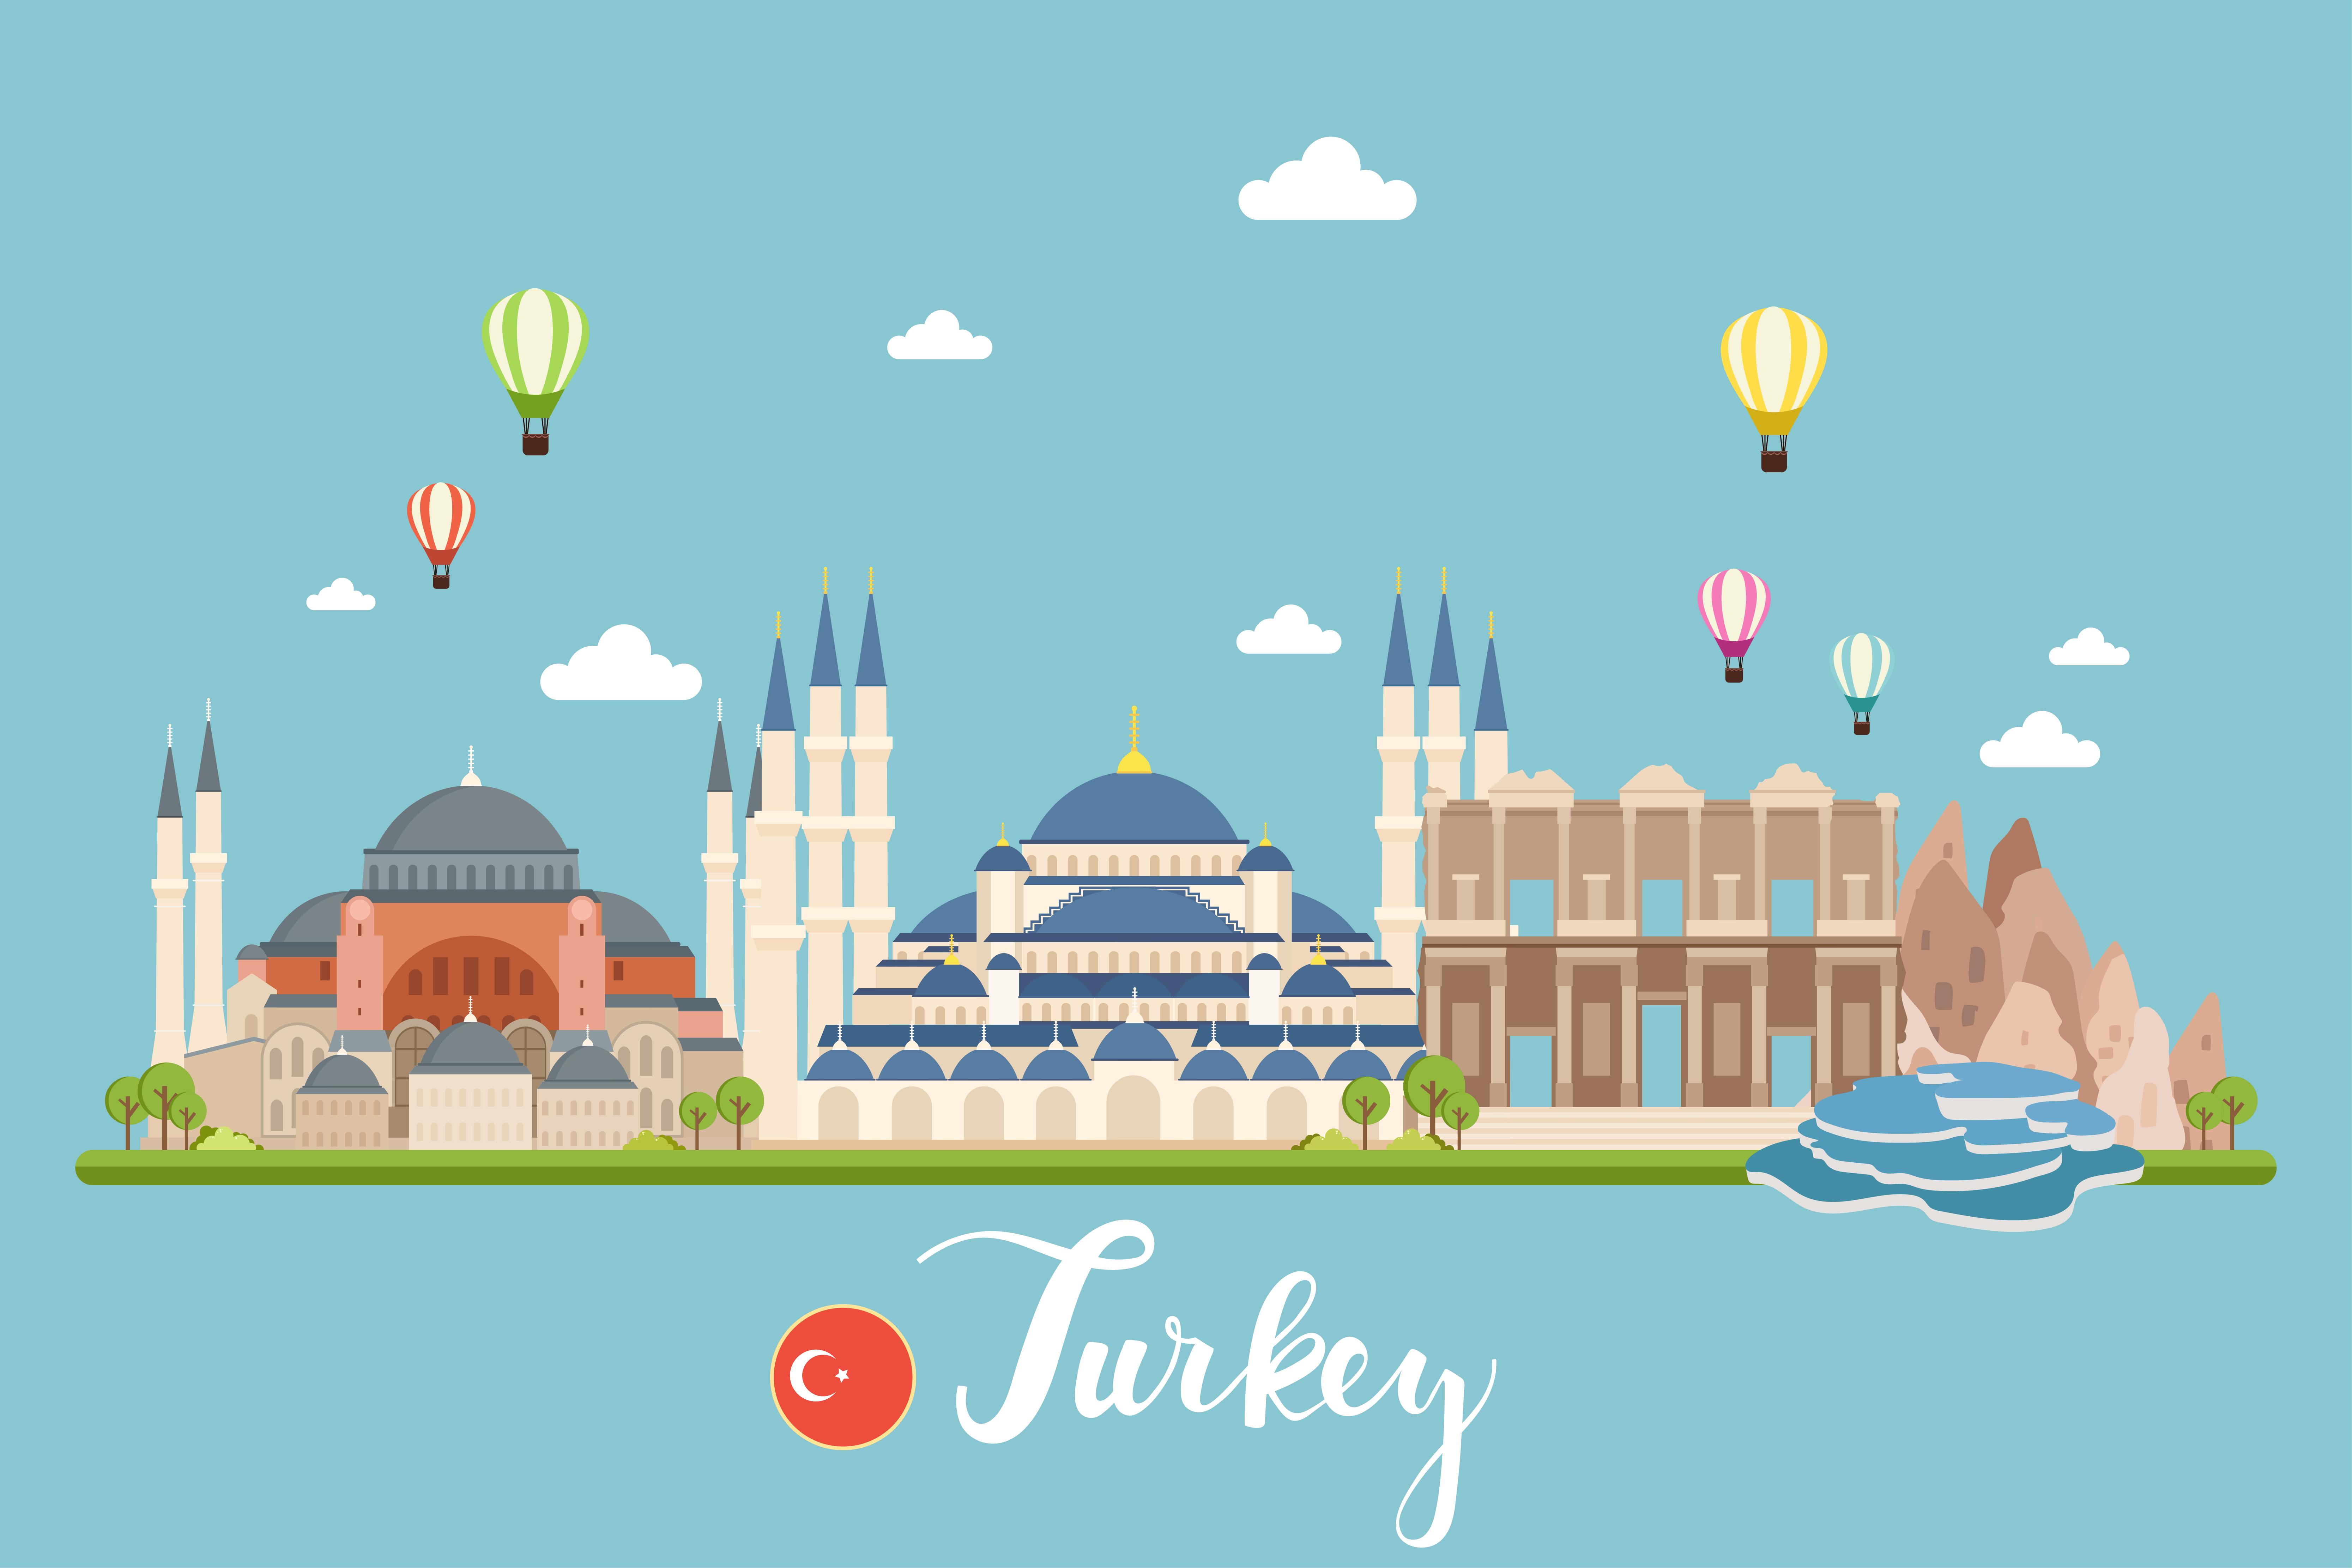 Turkey Travel Landscape - Download Free Vectors, Clipart ...